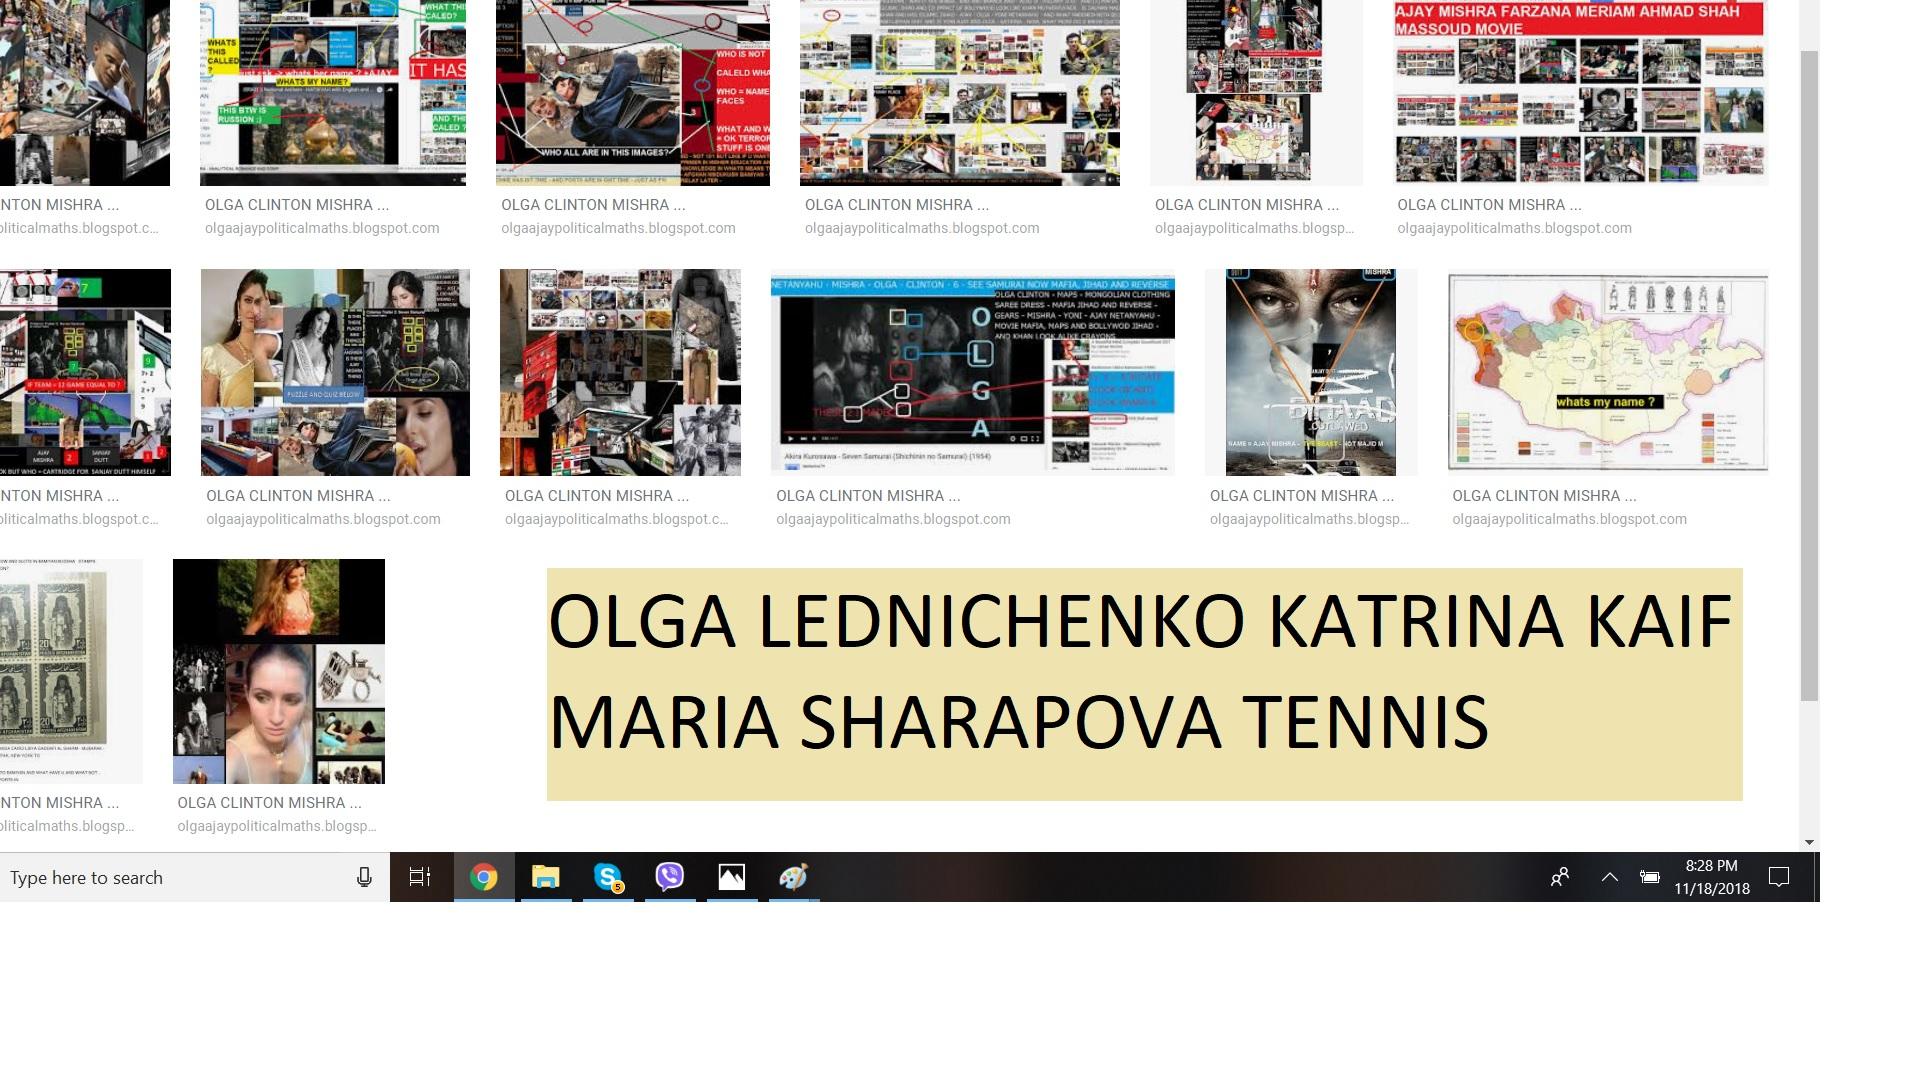 OLGA LEDNICHENKO KATRINA KAIF MARIA SHARAPOVA TENNIS 3